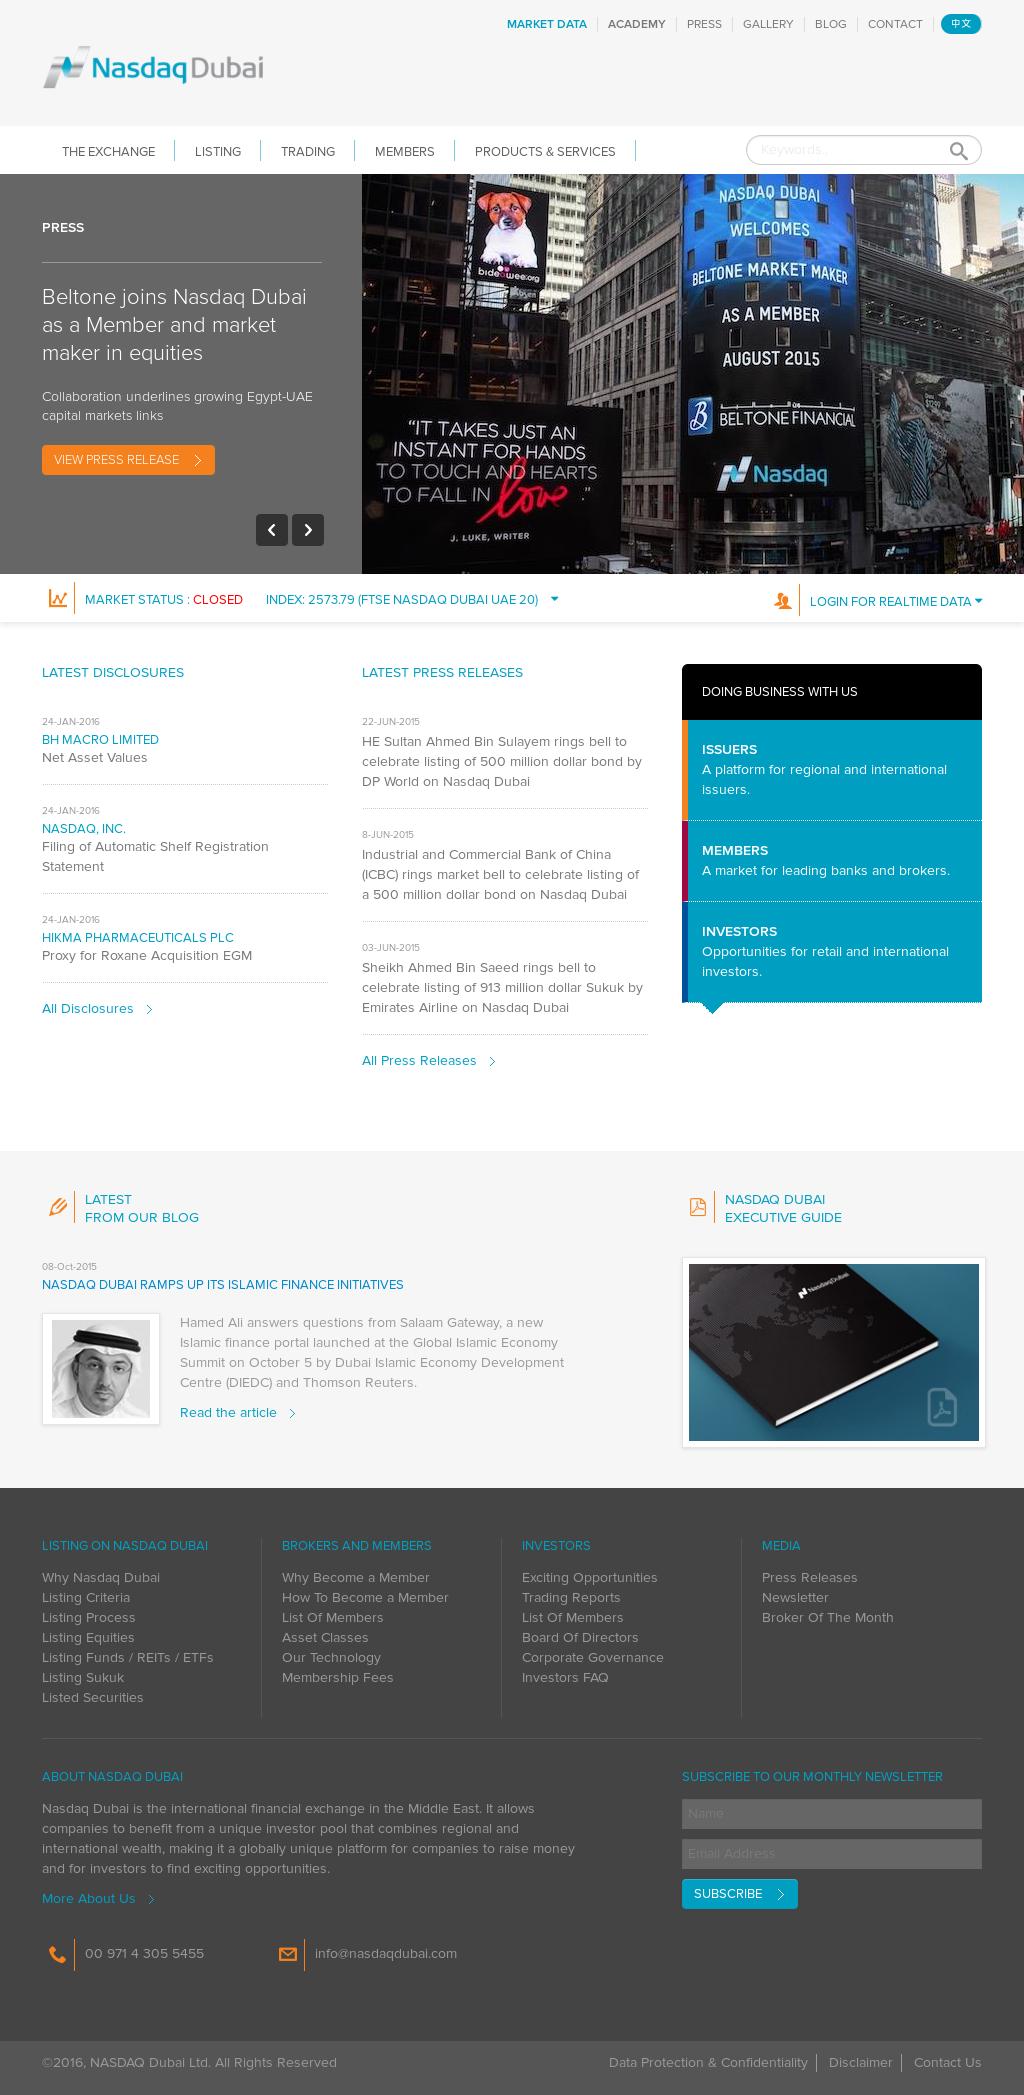 NASDAQ Dubai Competitors, Revenue and Employees - Owler Company Profile